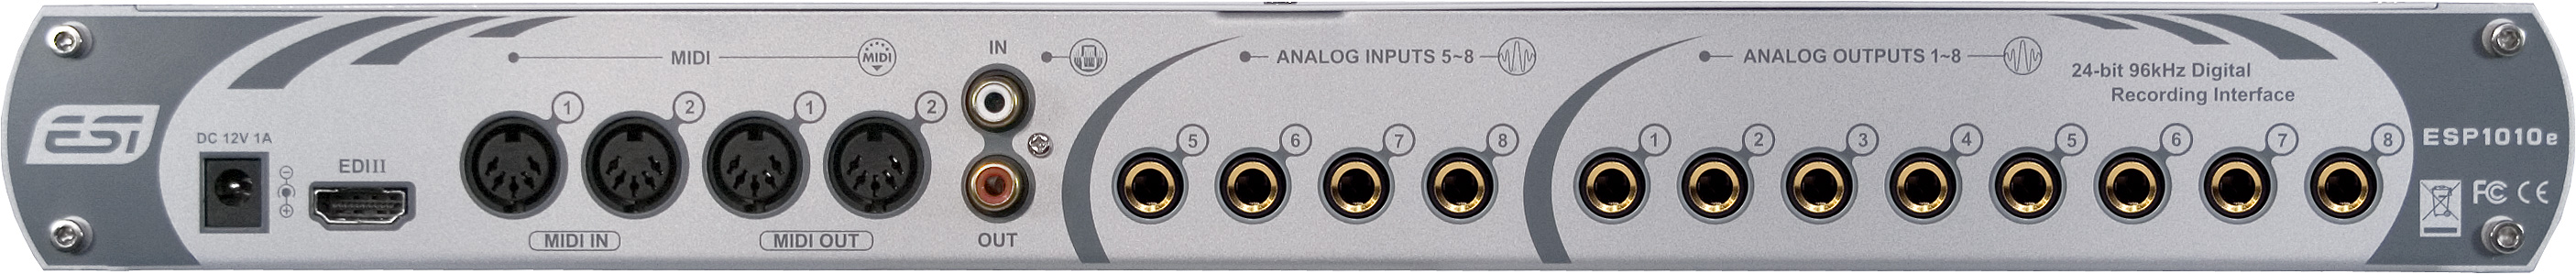 ESI ESP1010e Audio Interface Driver (2019)